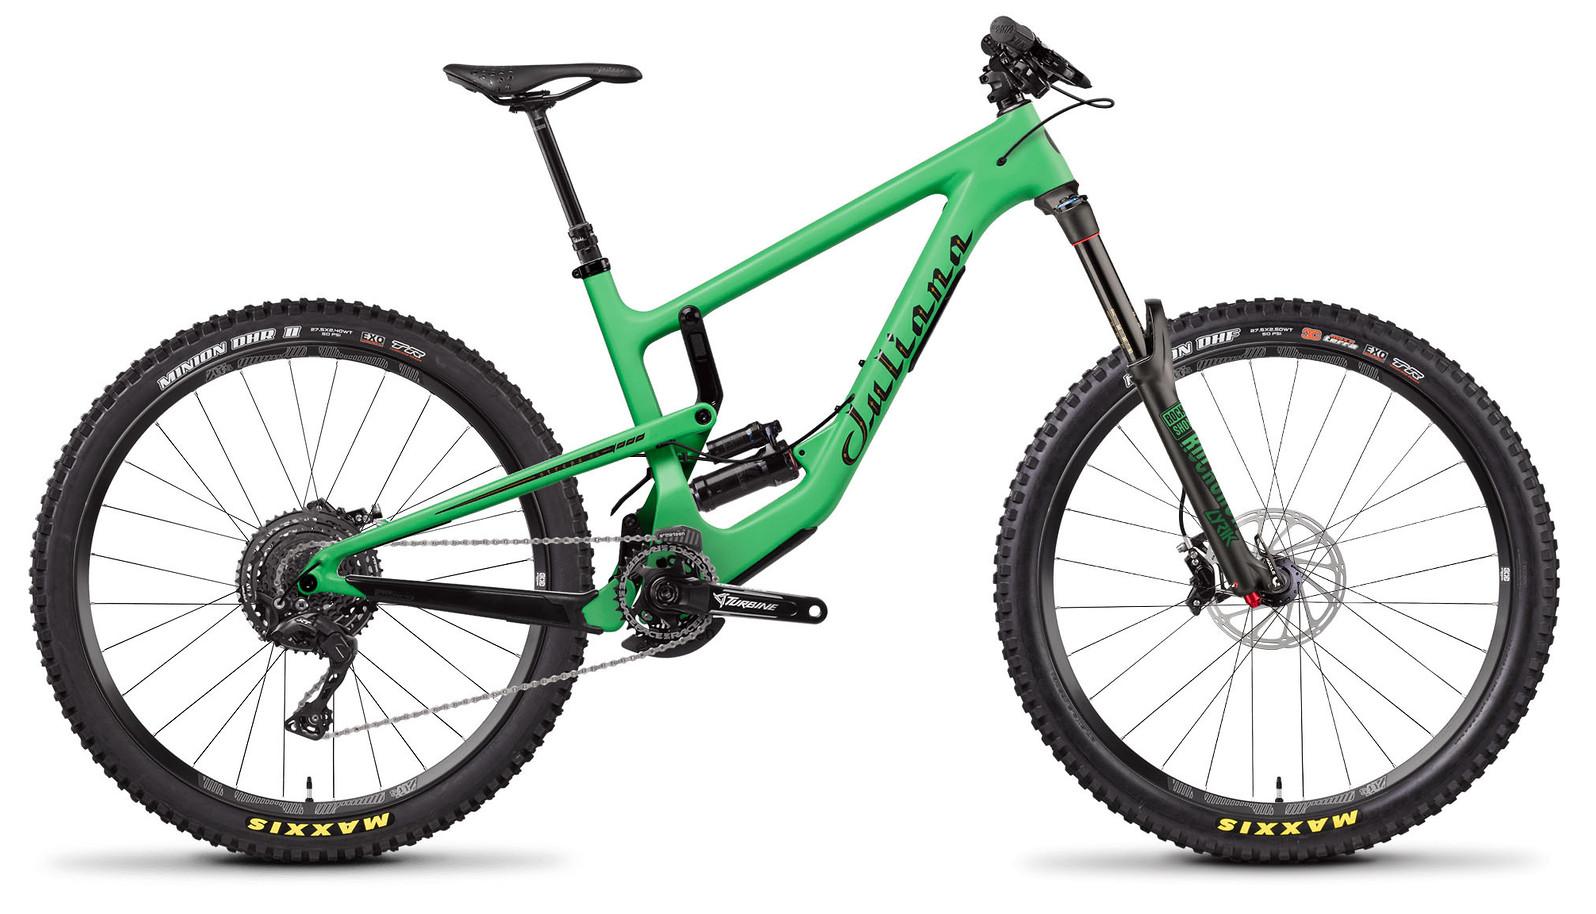 2018 Juliana Strega Carbon C XE Bike